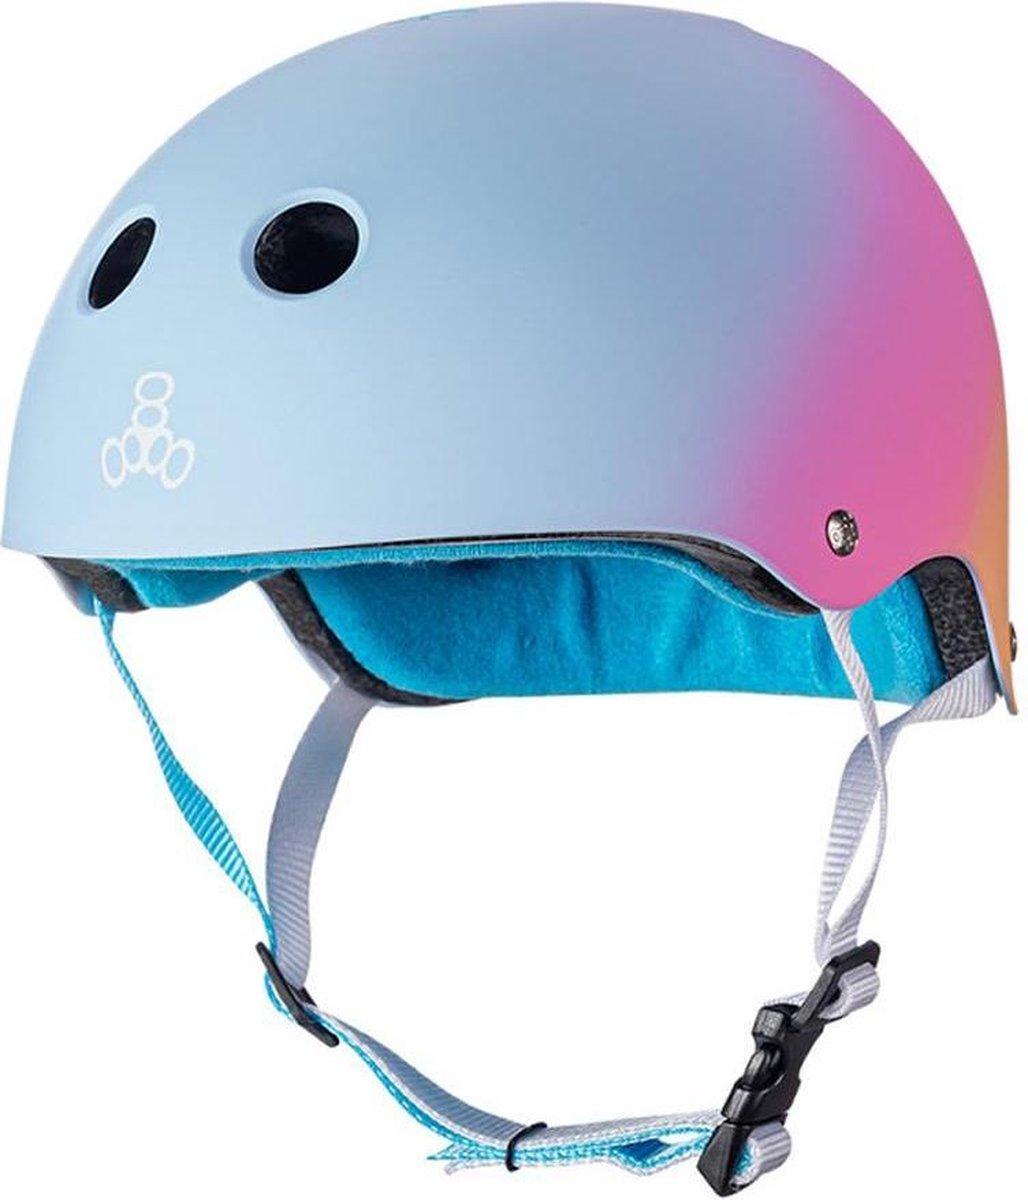 The Certified Sweatsaver Helmet Sunset XS/S